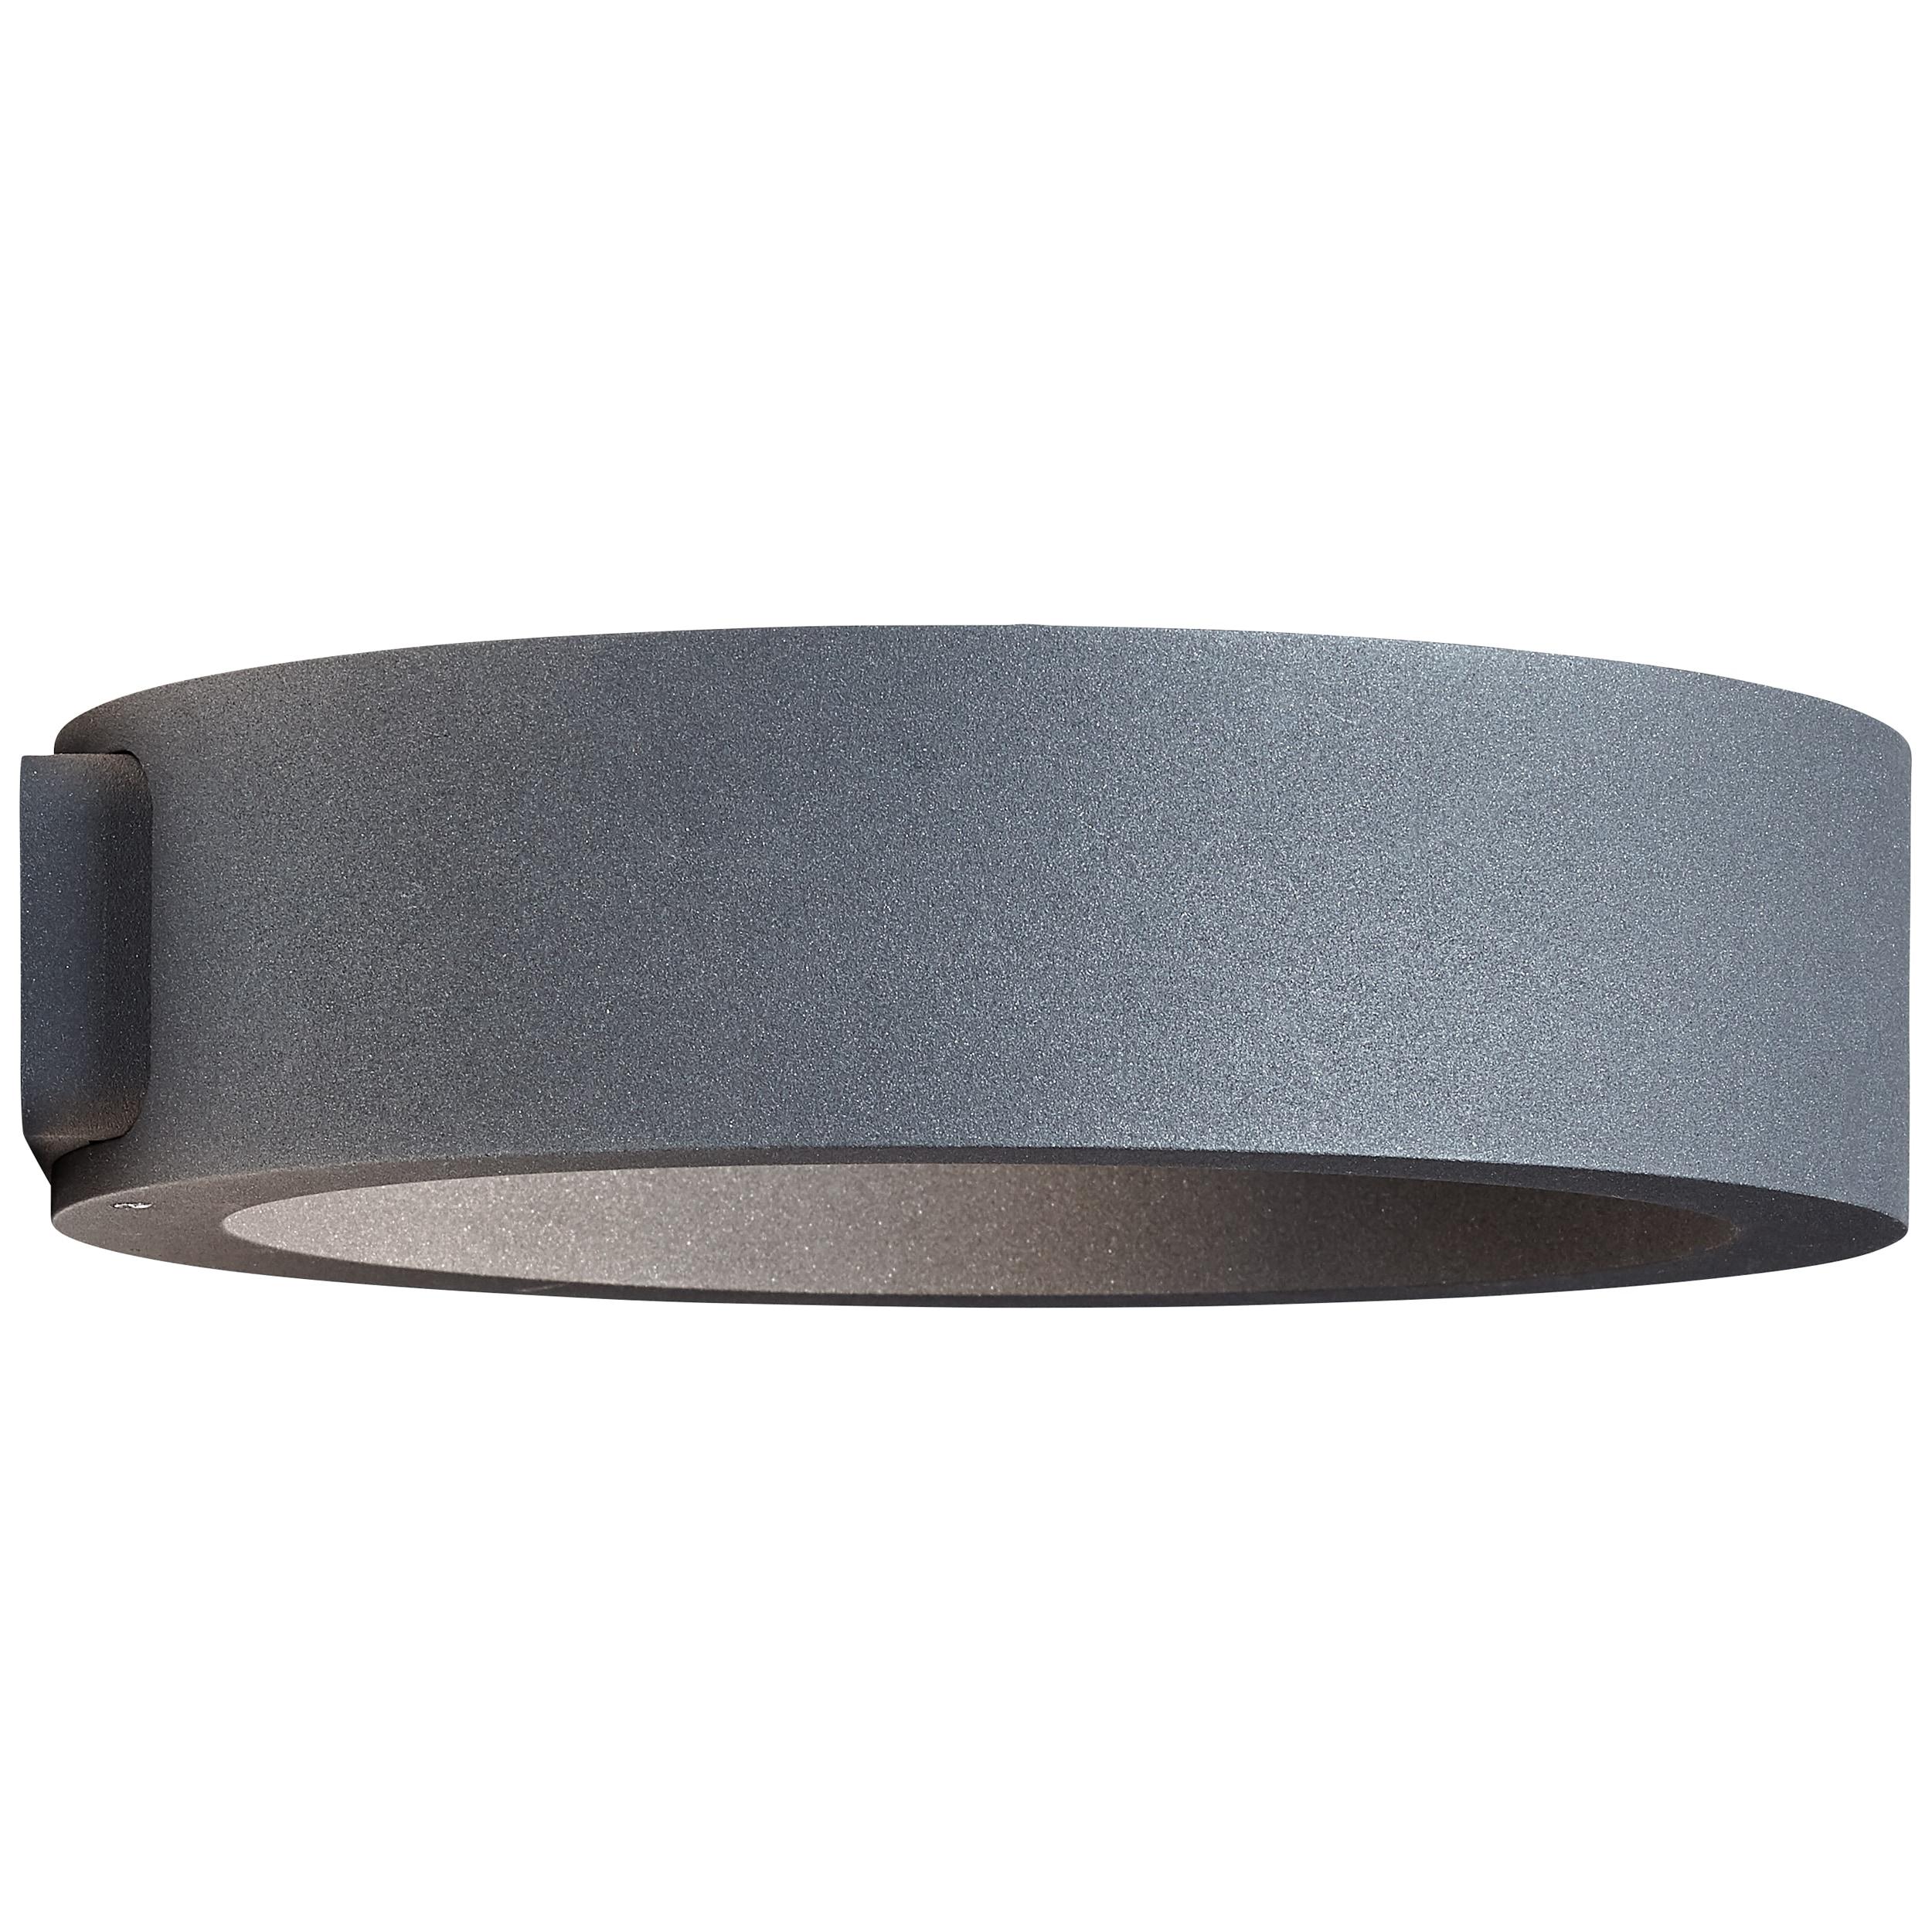 AEG Xever LED Außenwandleuchte 22cm anthrazit